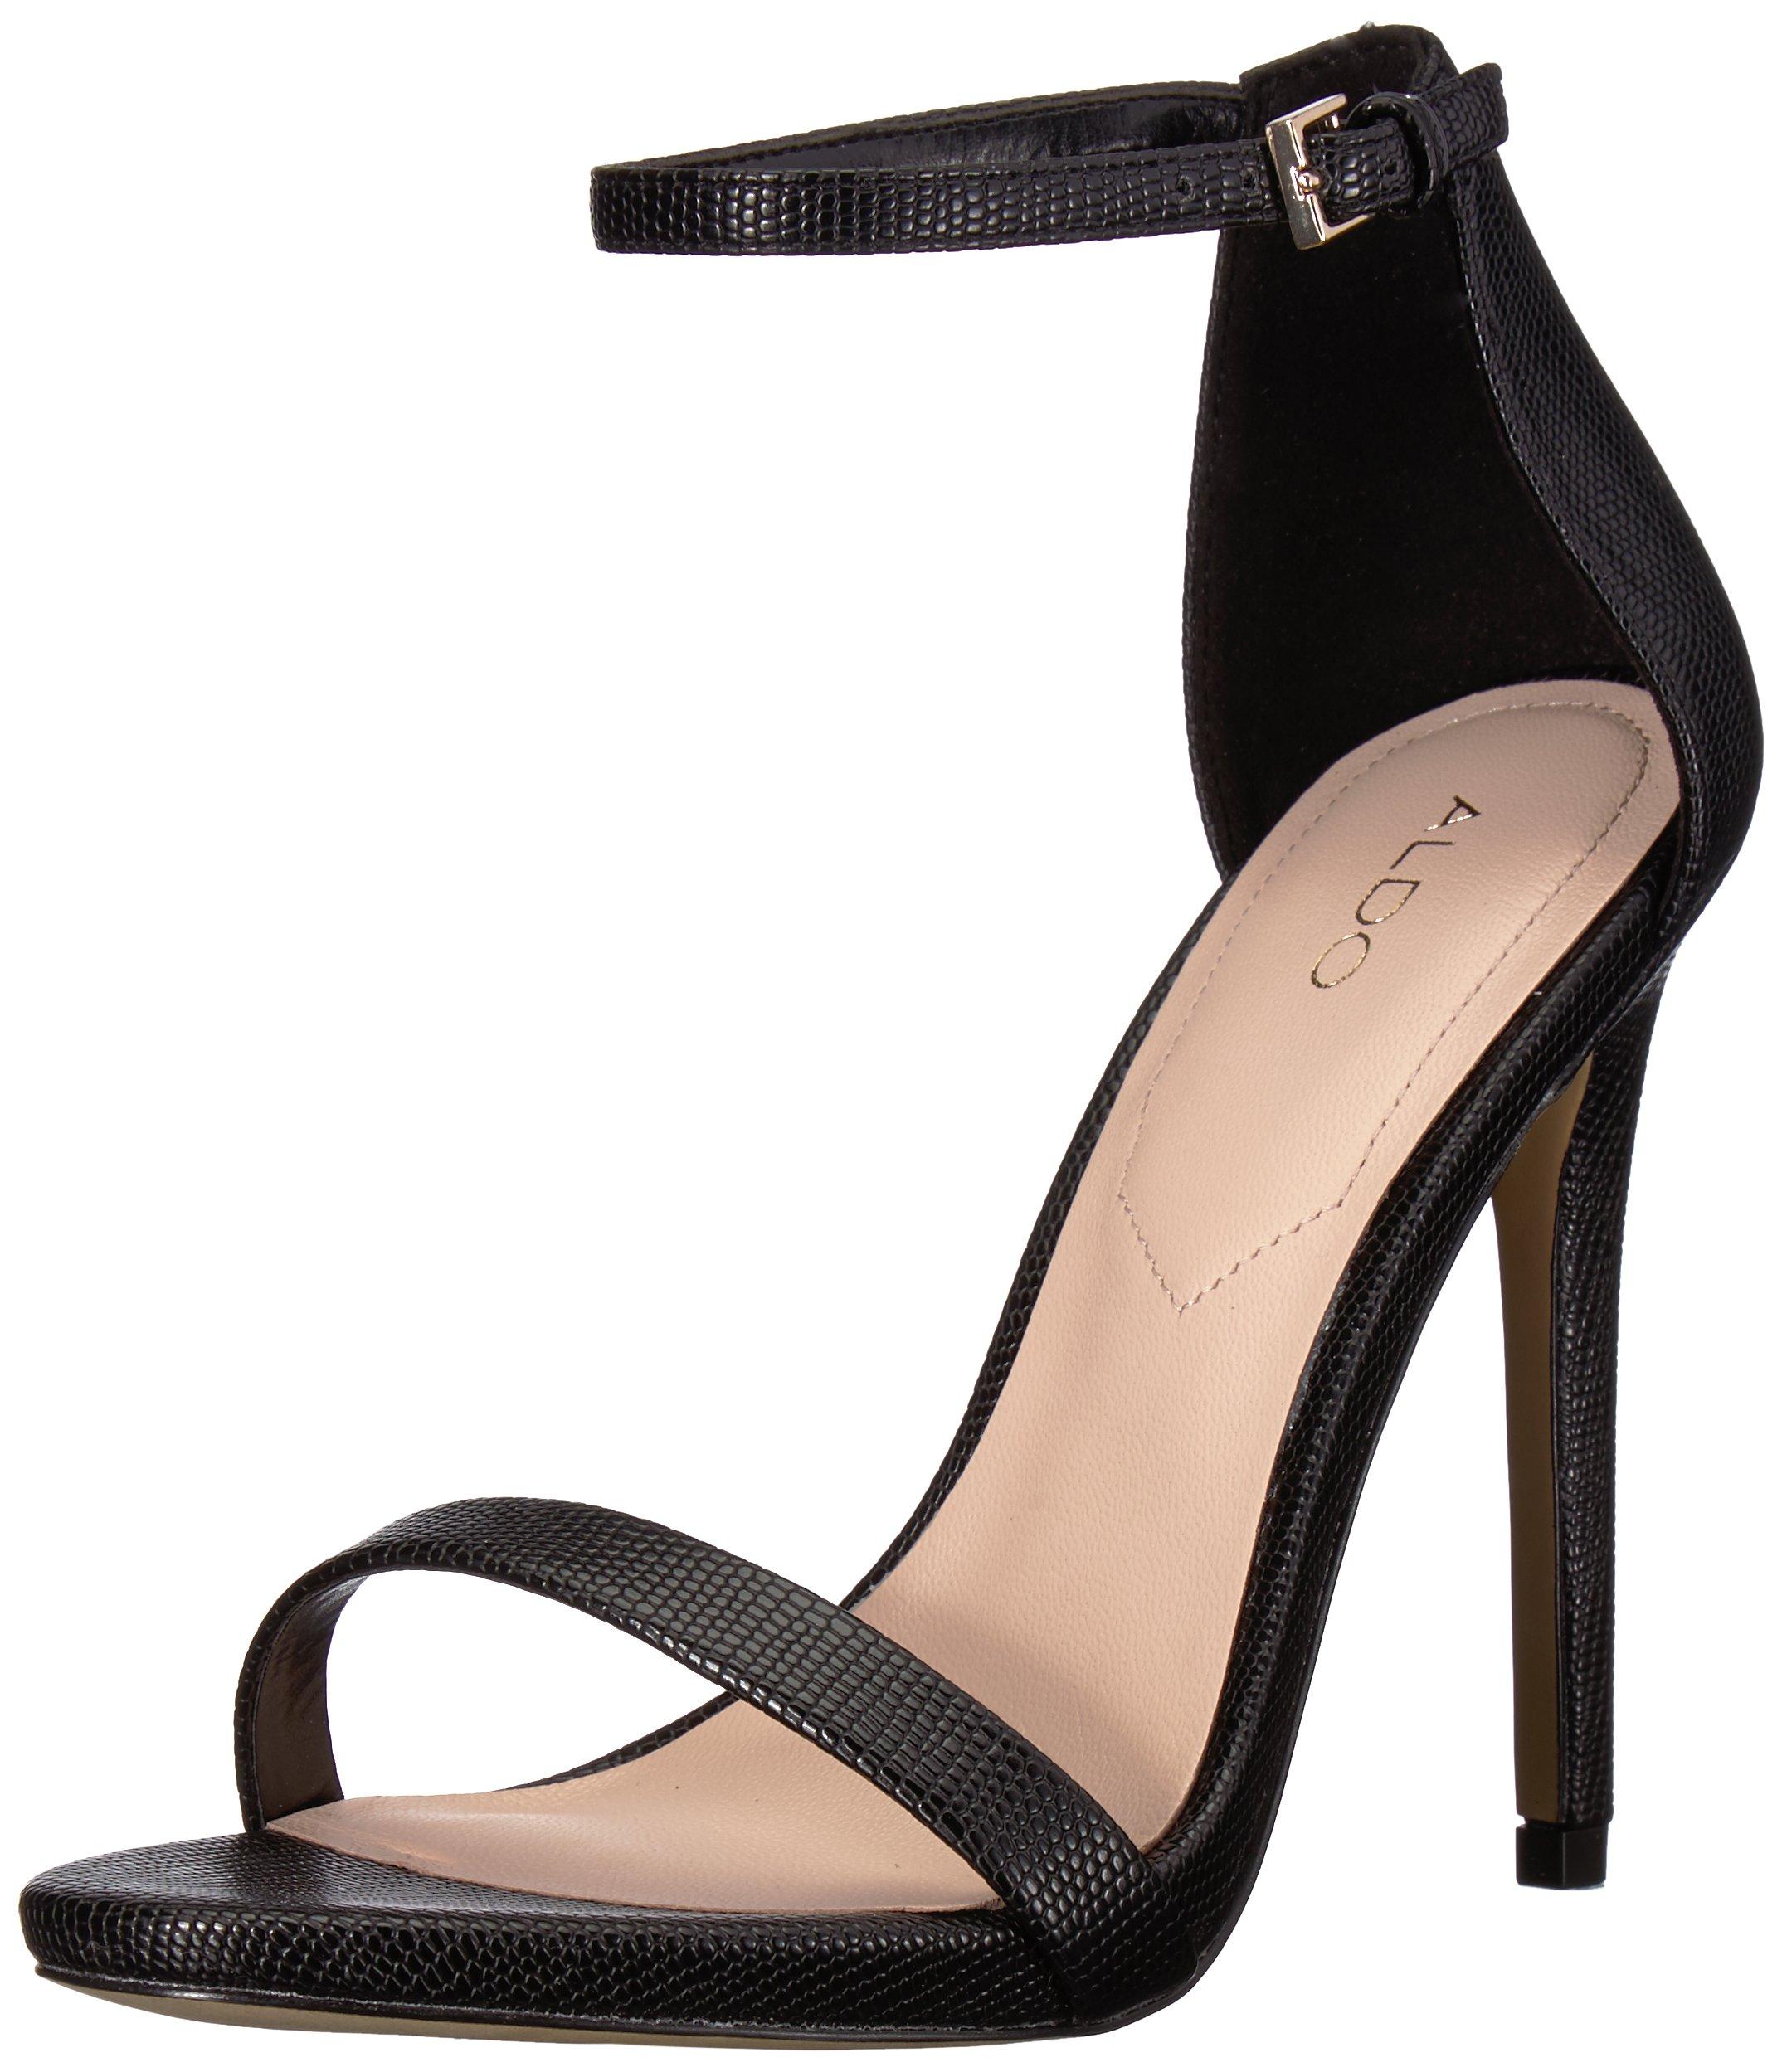 ویکالا · خرید  اصل اورجینال · خرید از آمازون · ALDO Women's CARAA Heeled Sandal, Black Synthetic, 9 B US wekala · ویکالا